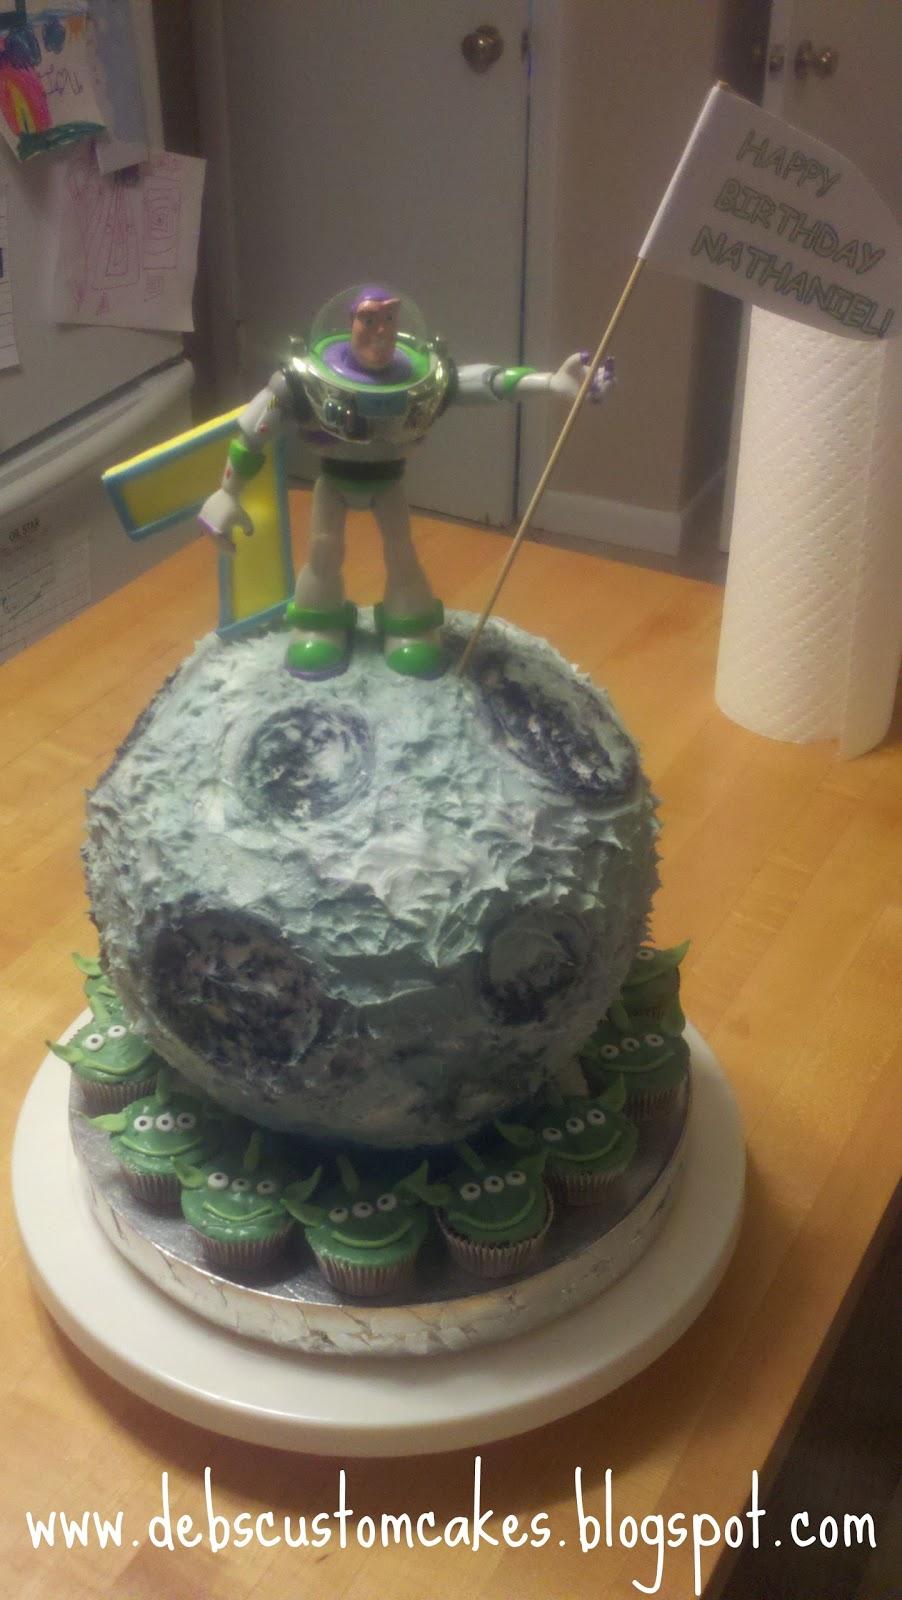 Birthday Cakes Omaha Ne